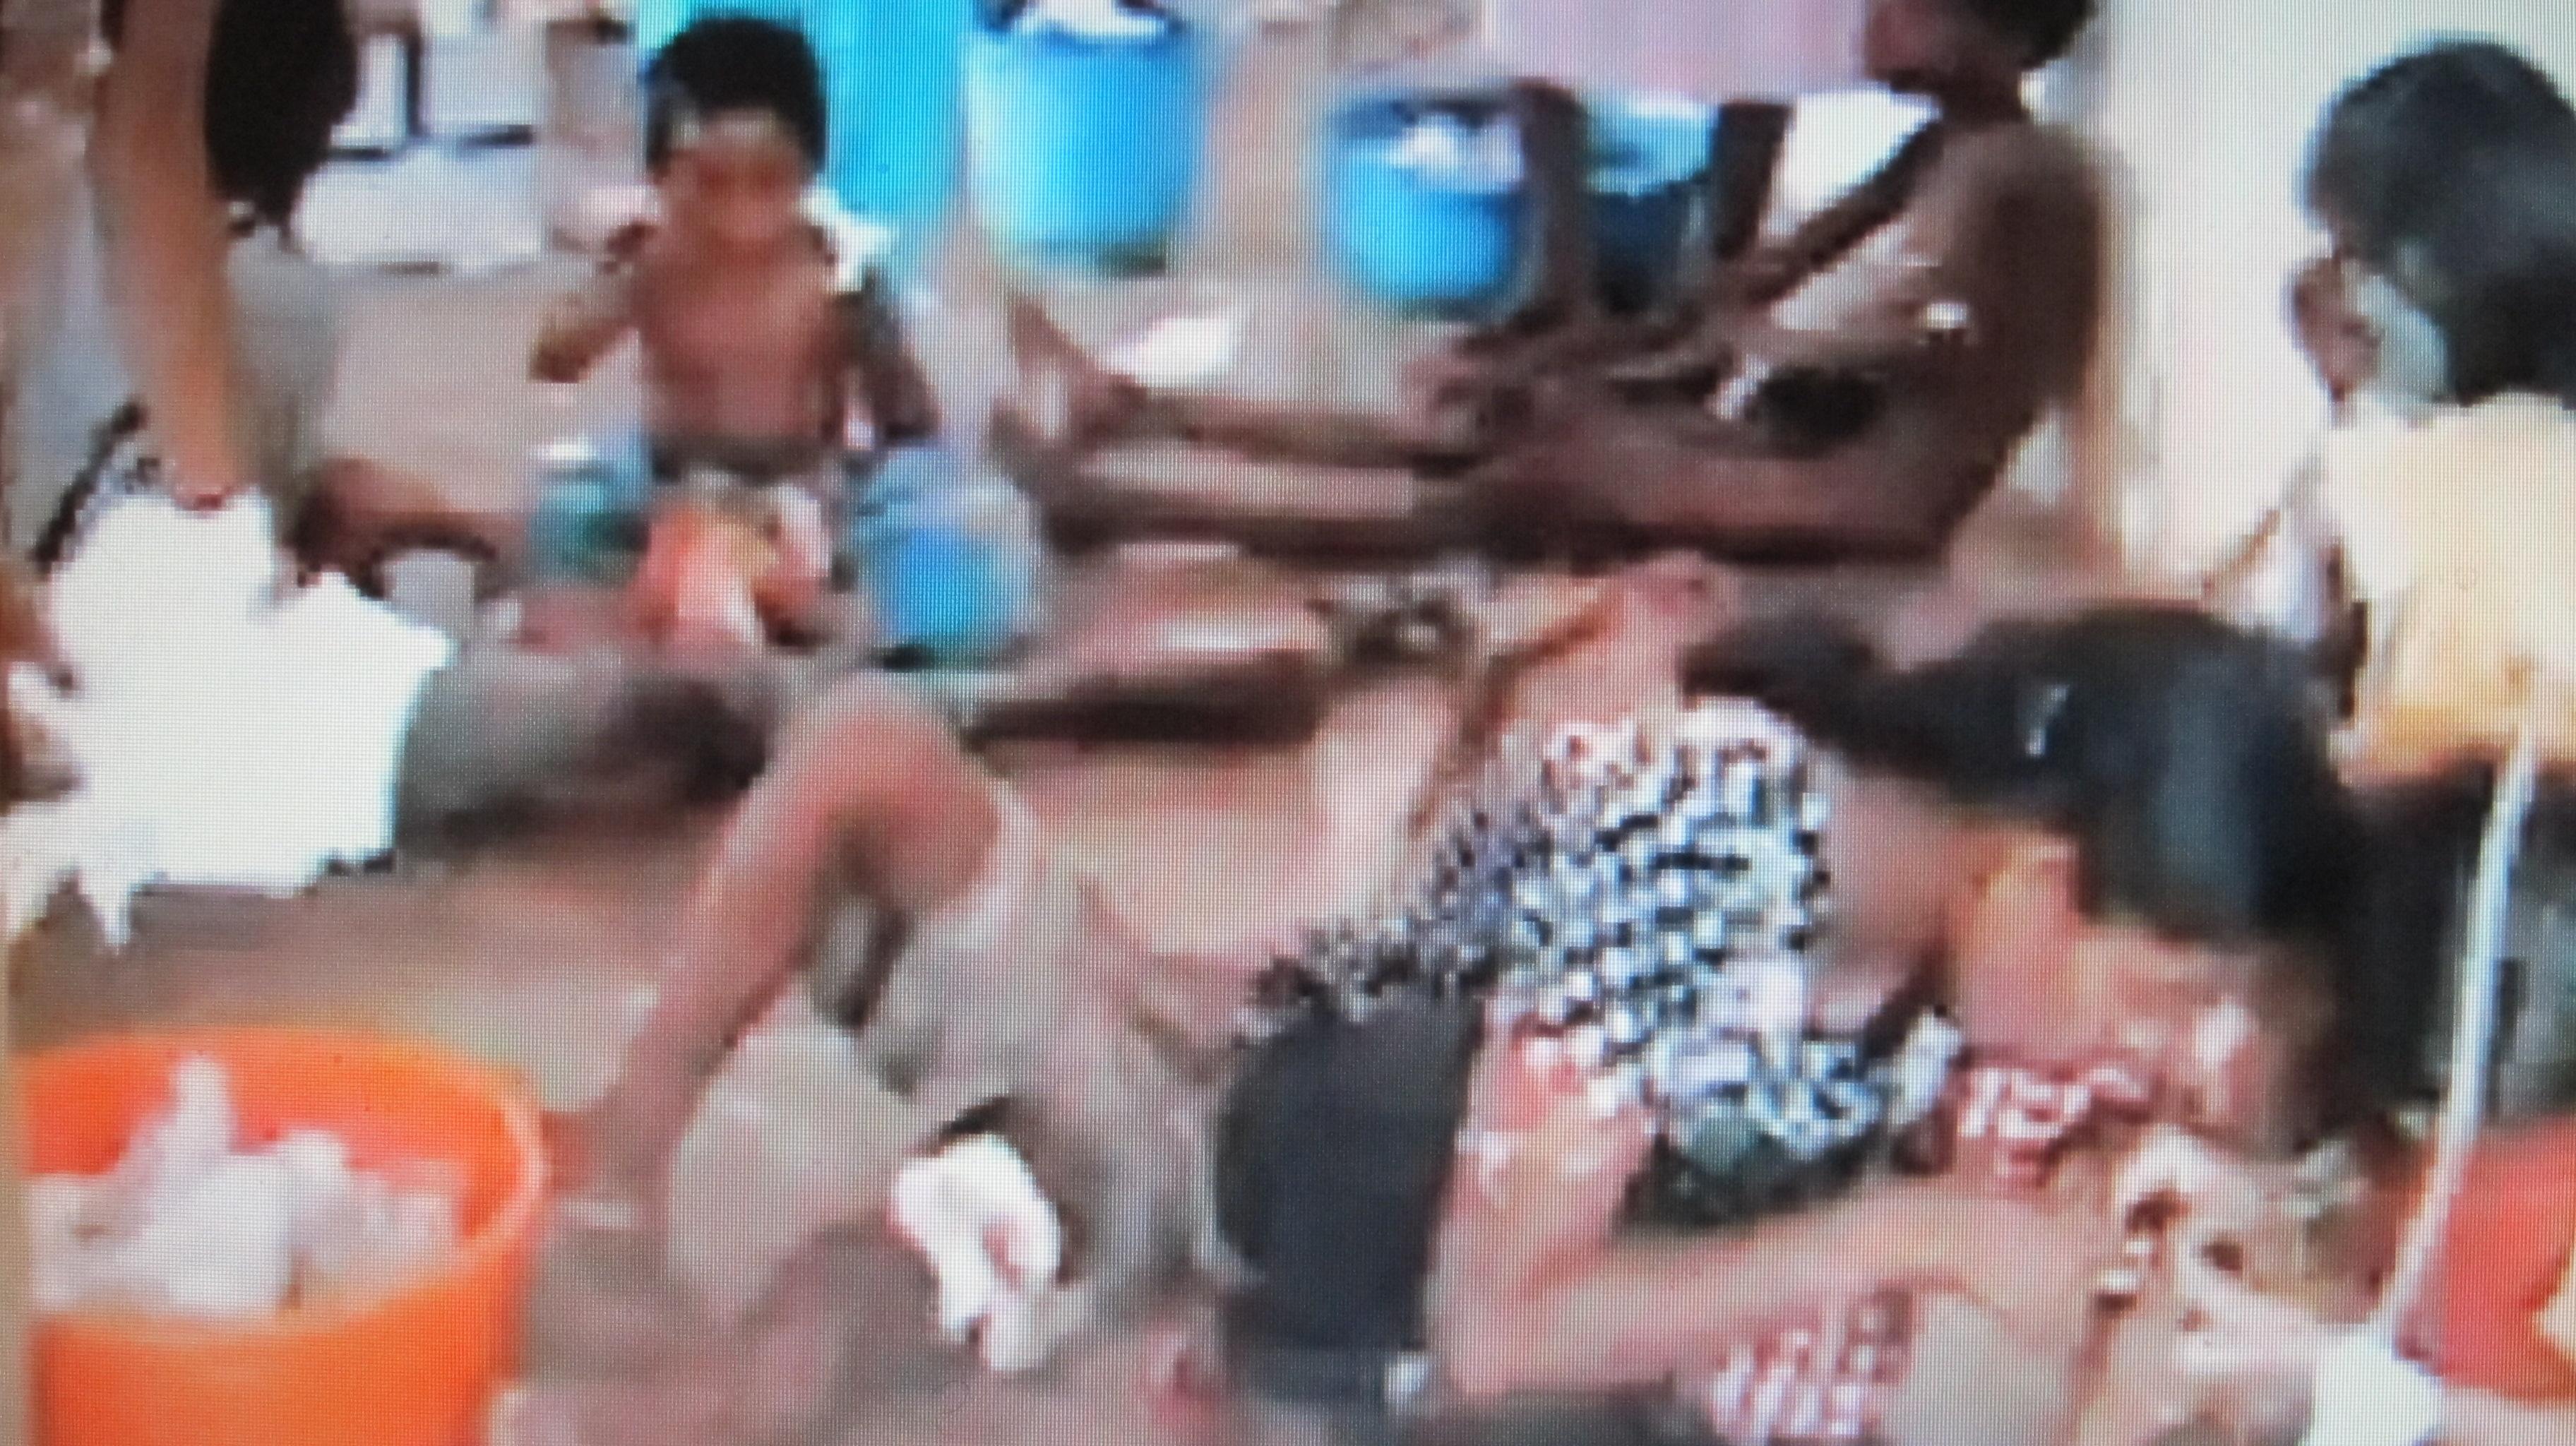 Tamil snuff porn on ABC | andrewmcintyre.org